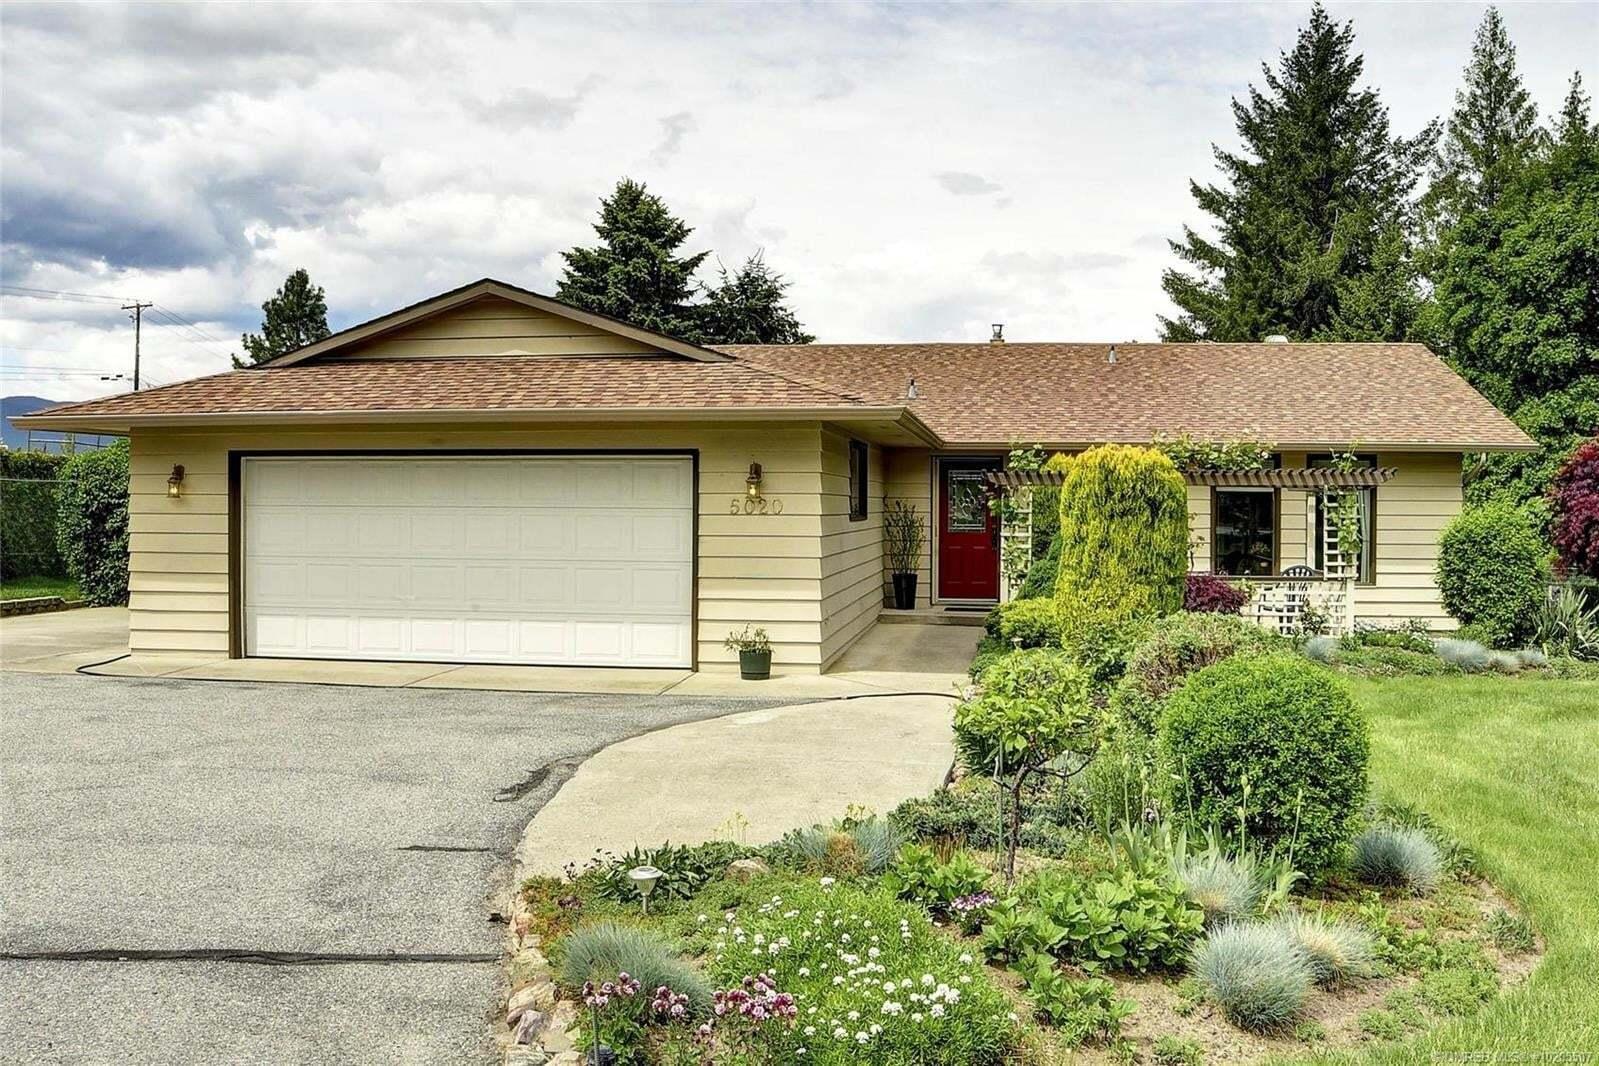 House for sale at 5020 Chute Lake Cres Kelowna British Columbia - MLS: 10205507